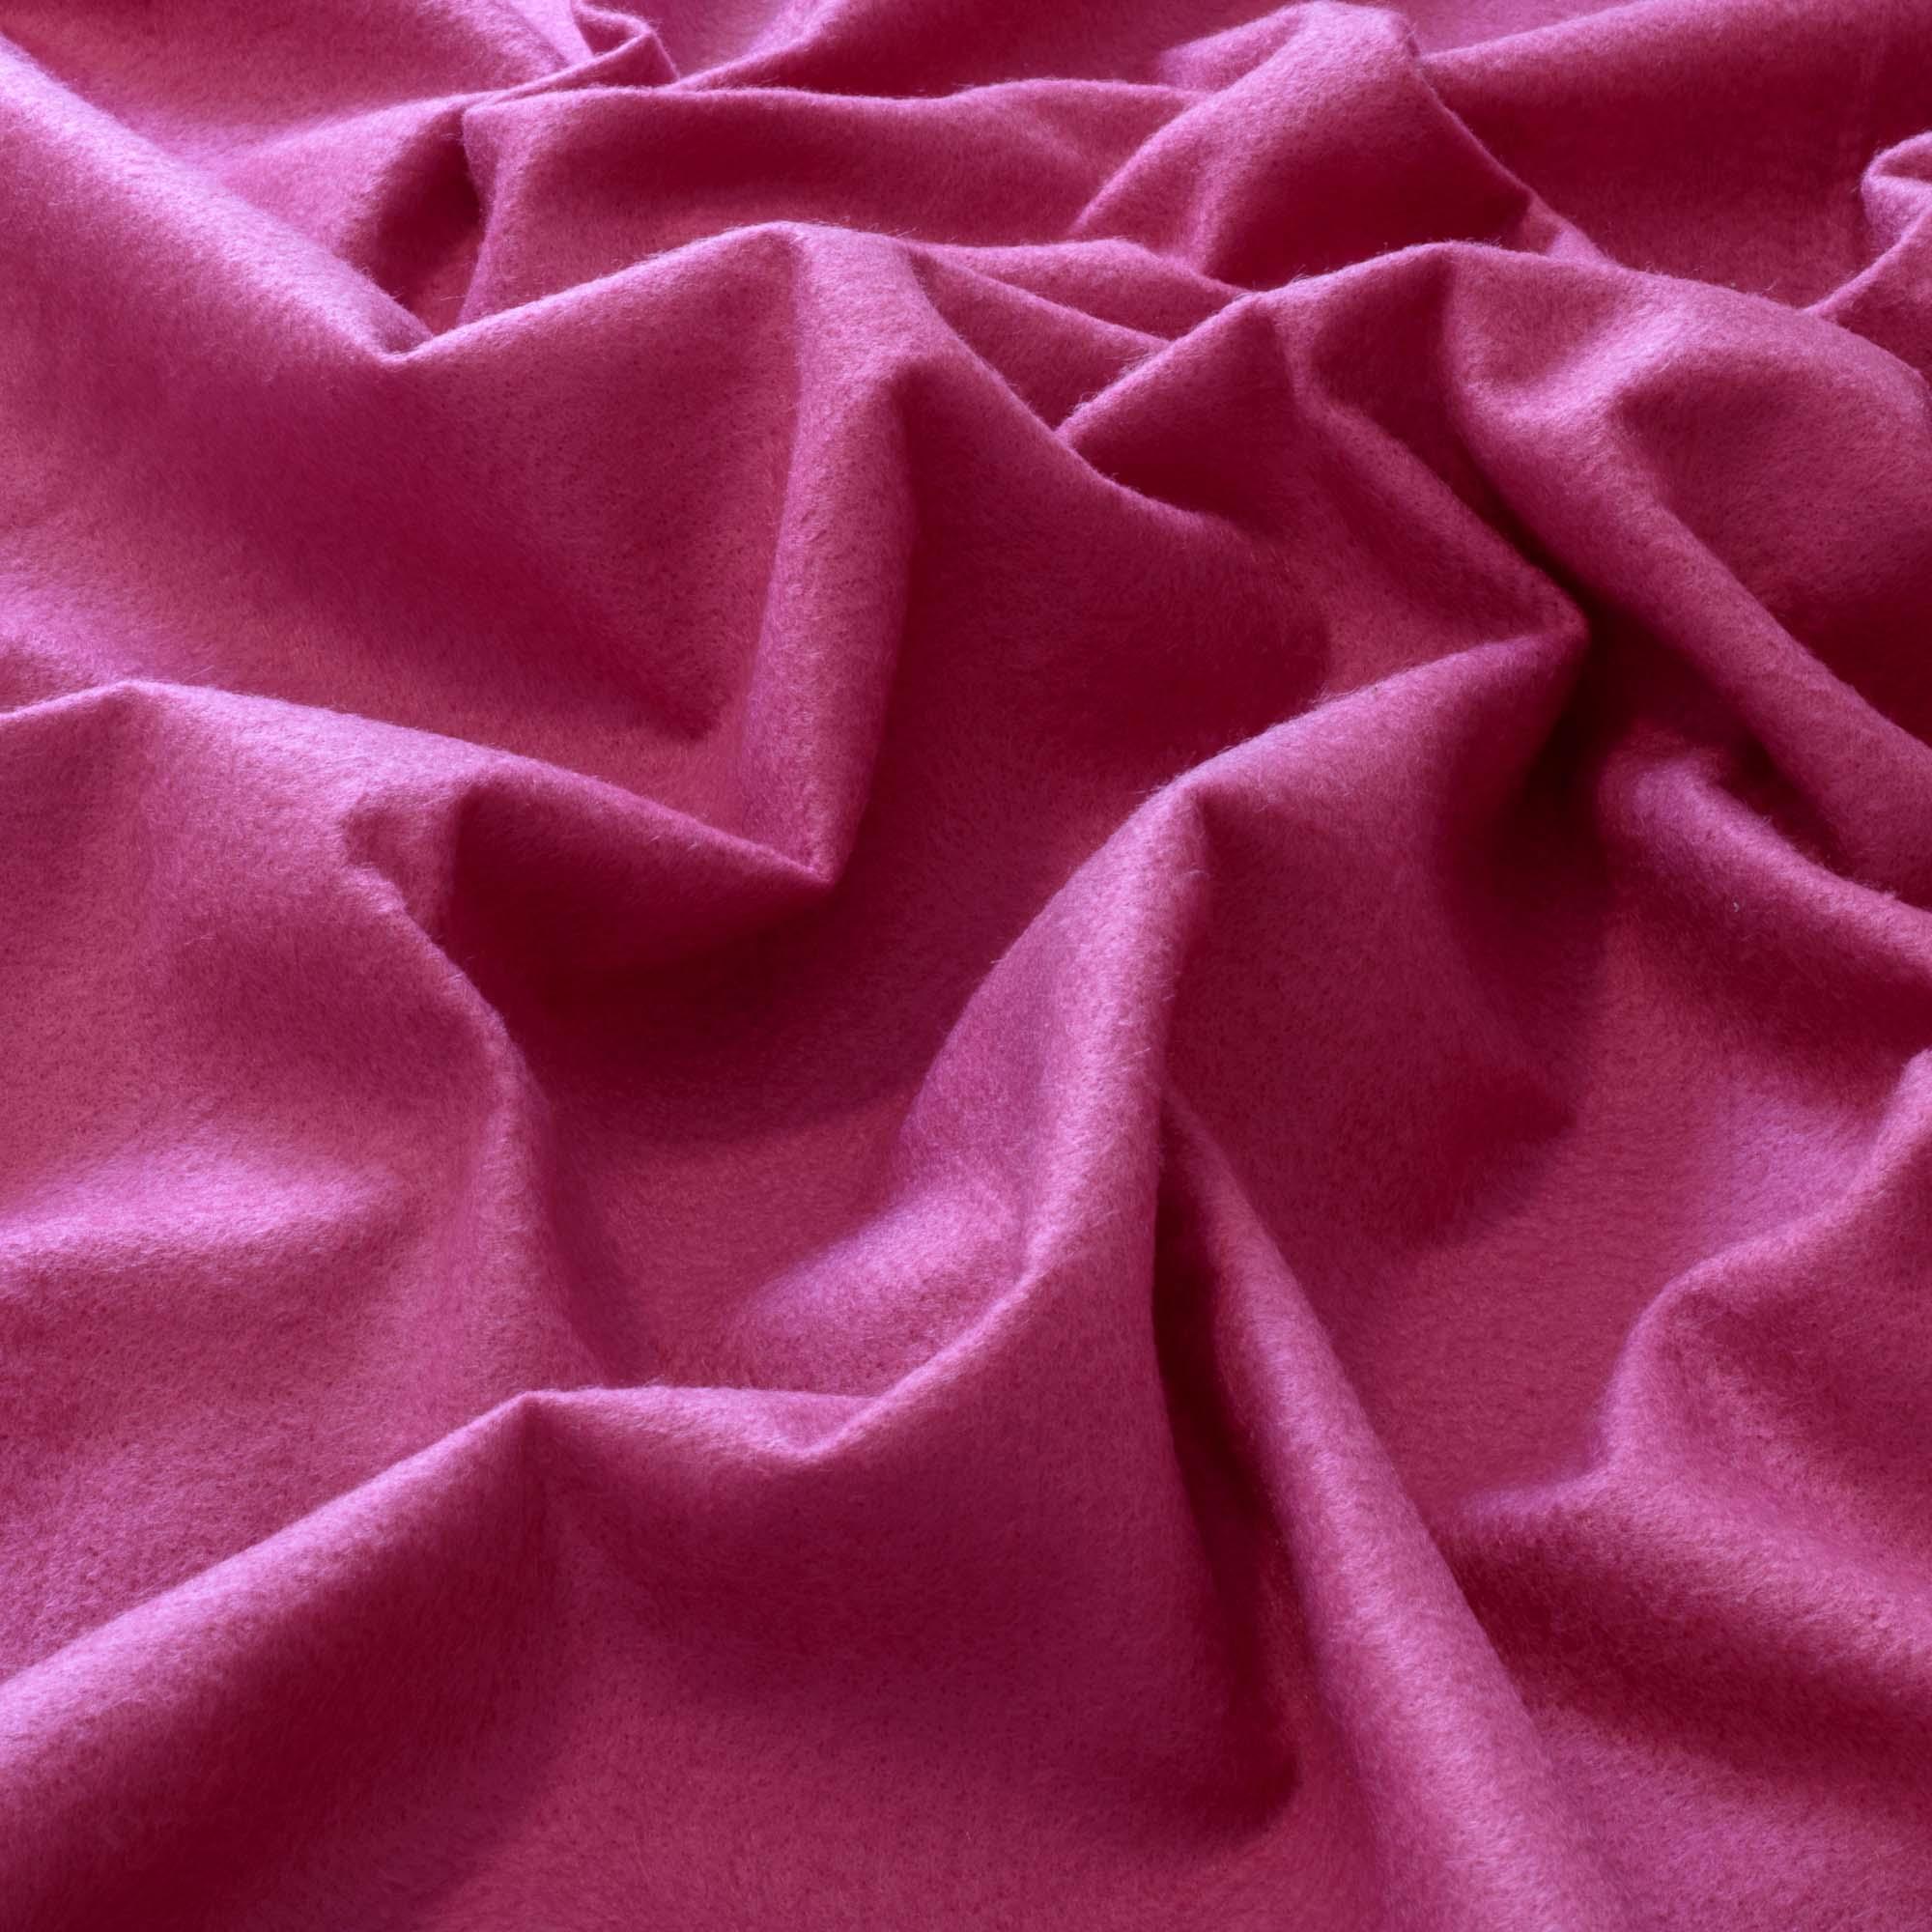 Tecido Feltro Rosa Pink 100% Poliester 1,40 m Largura